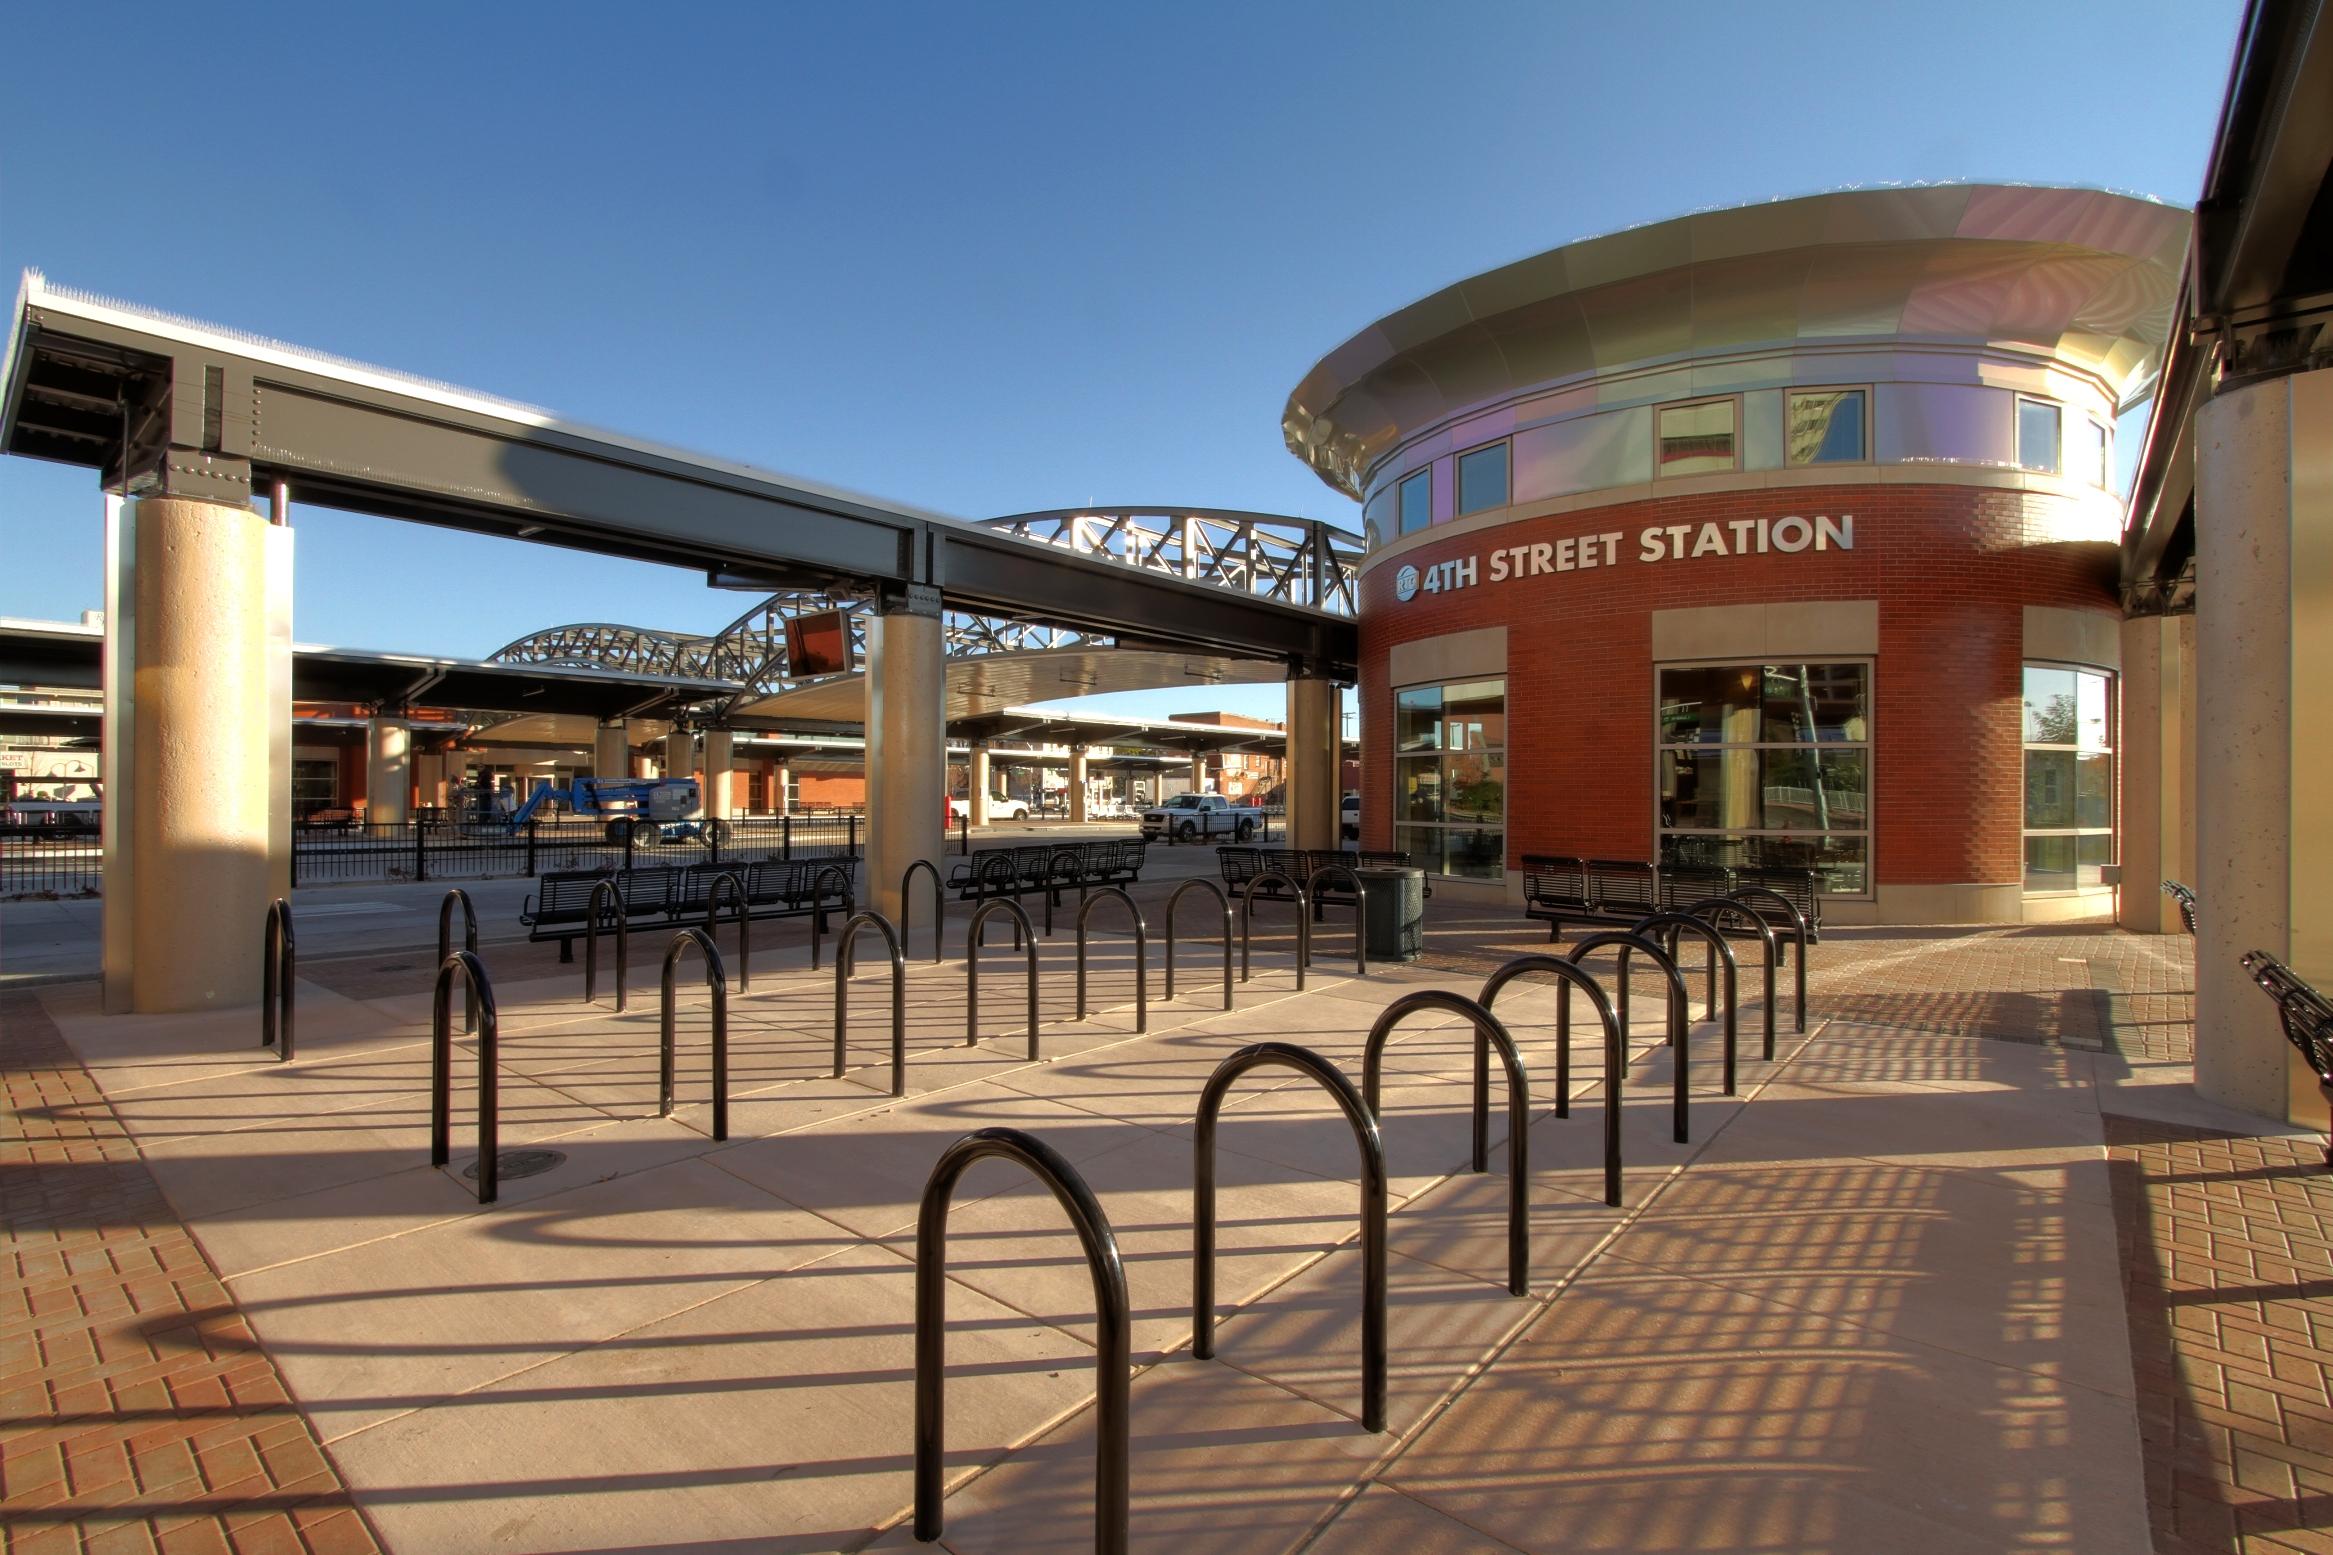 RTC Transit Center 064.jpg